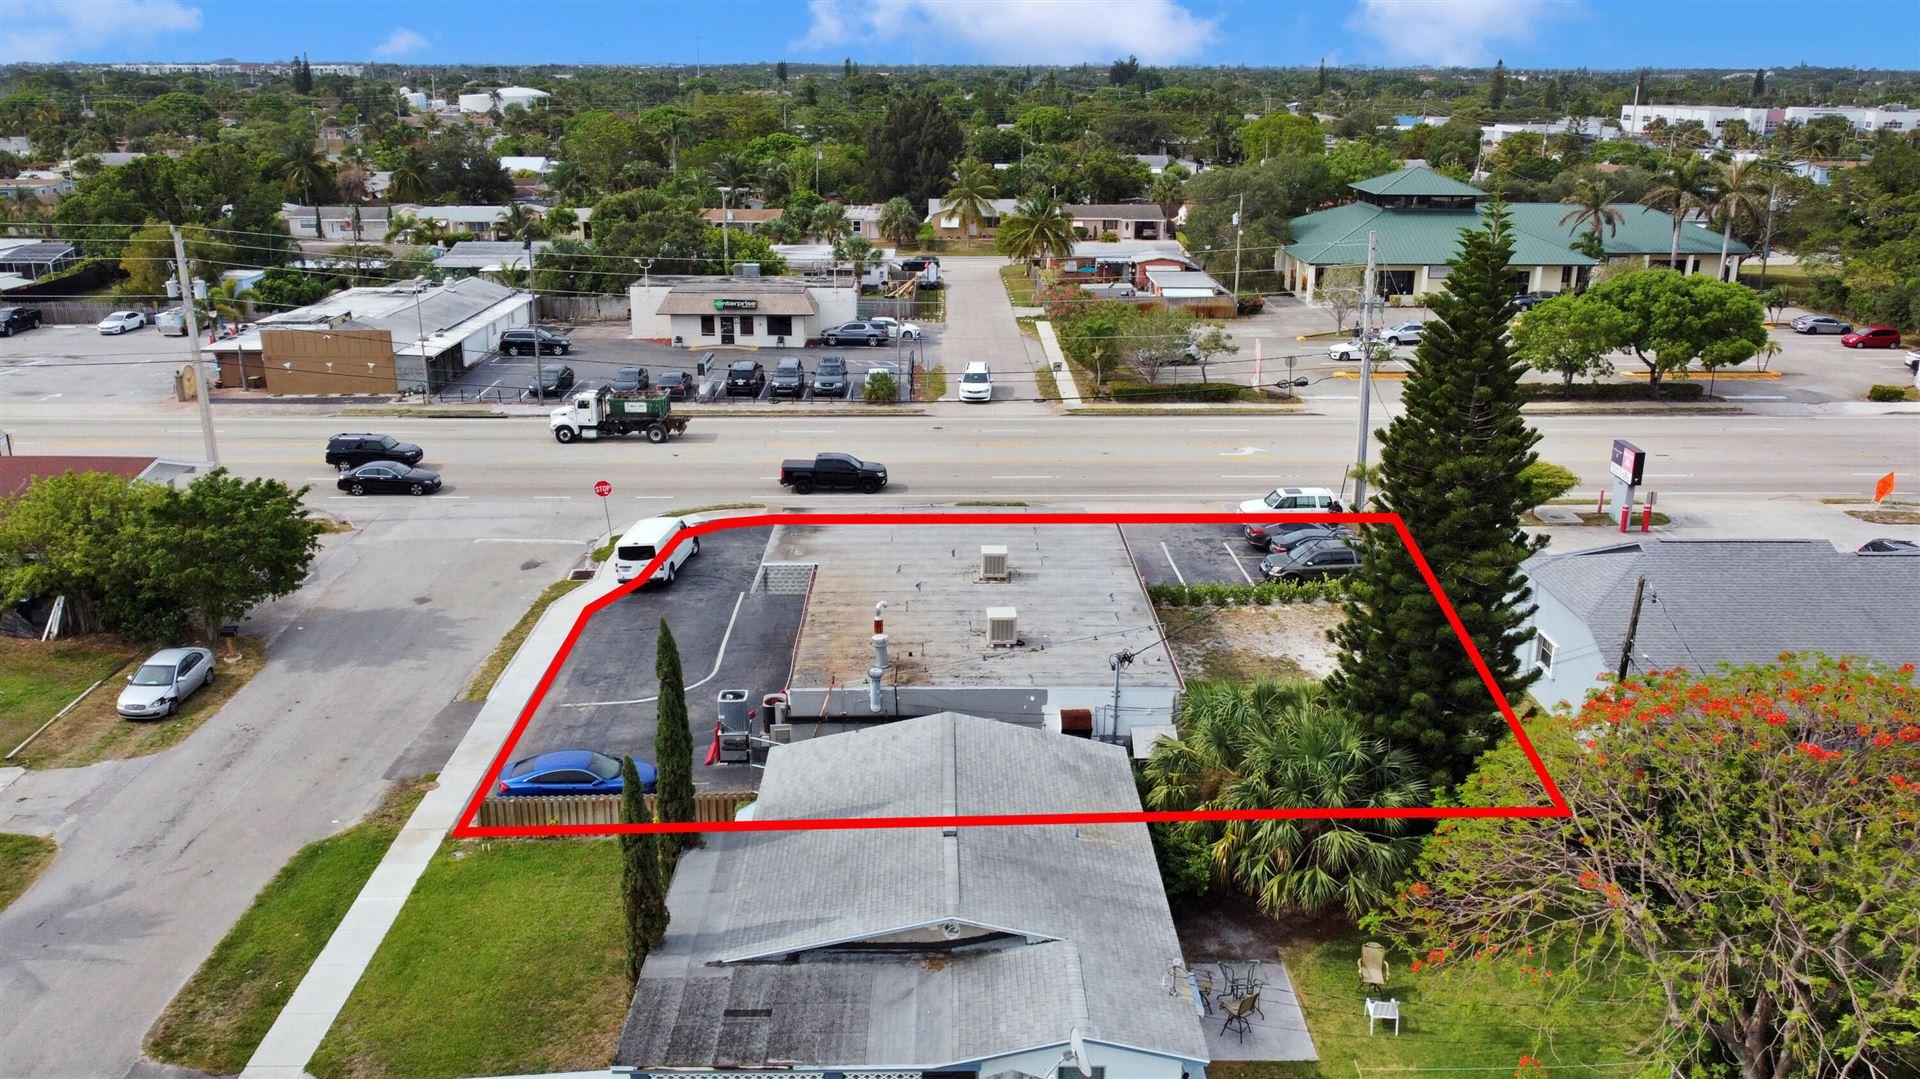 Photo of 701 W Lantana Road, Lantana, FL 33462 (MLS # RX-10716998)